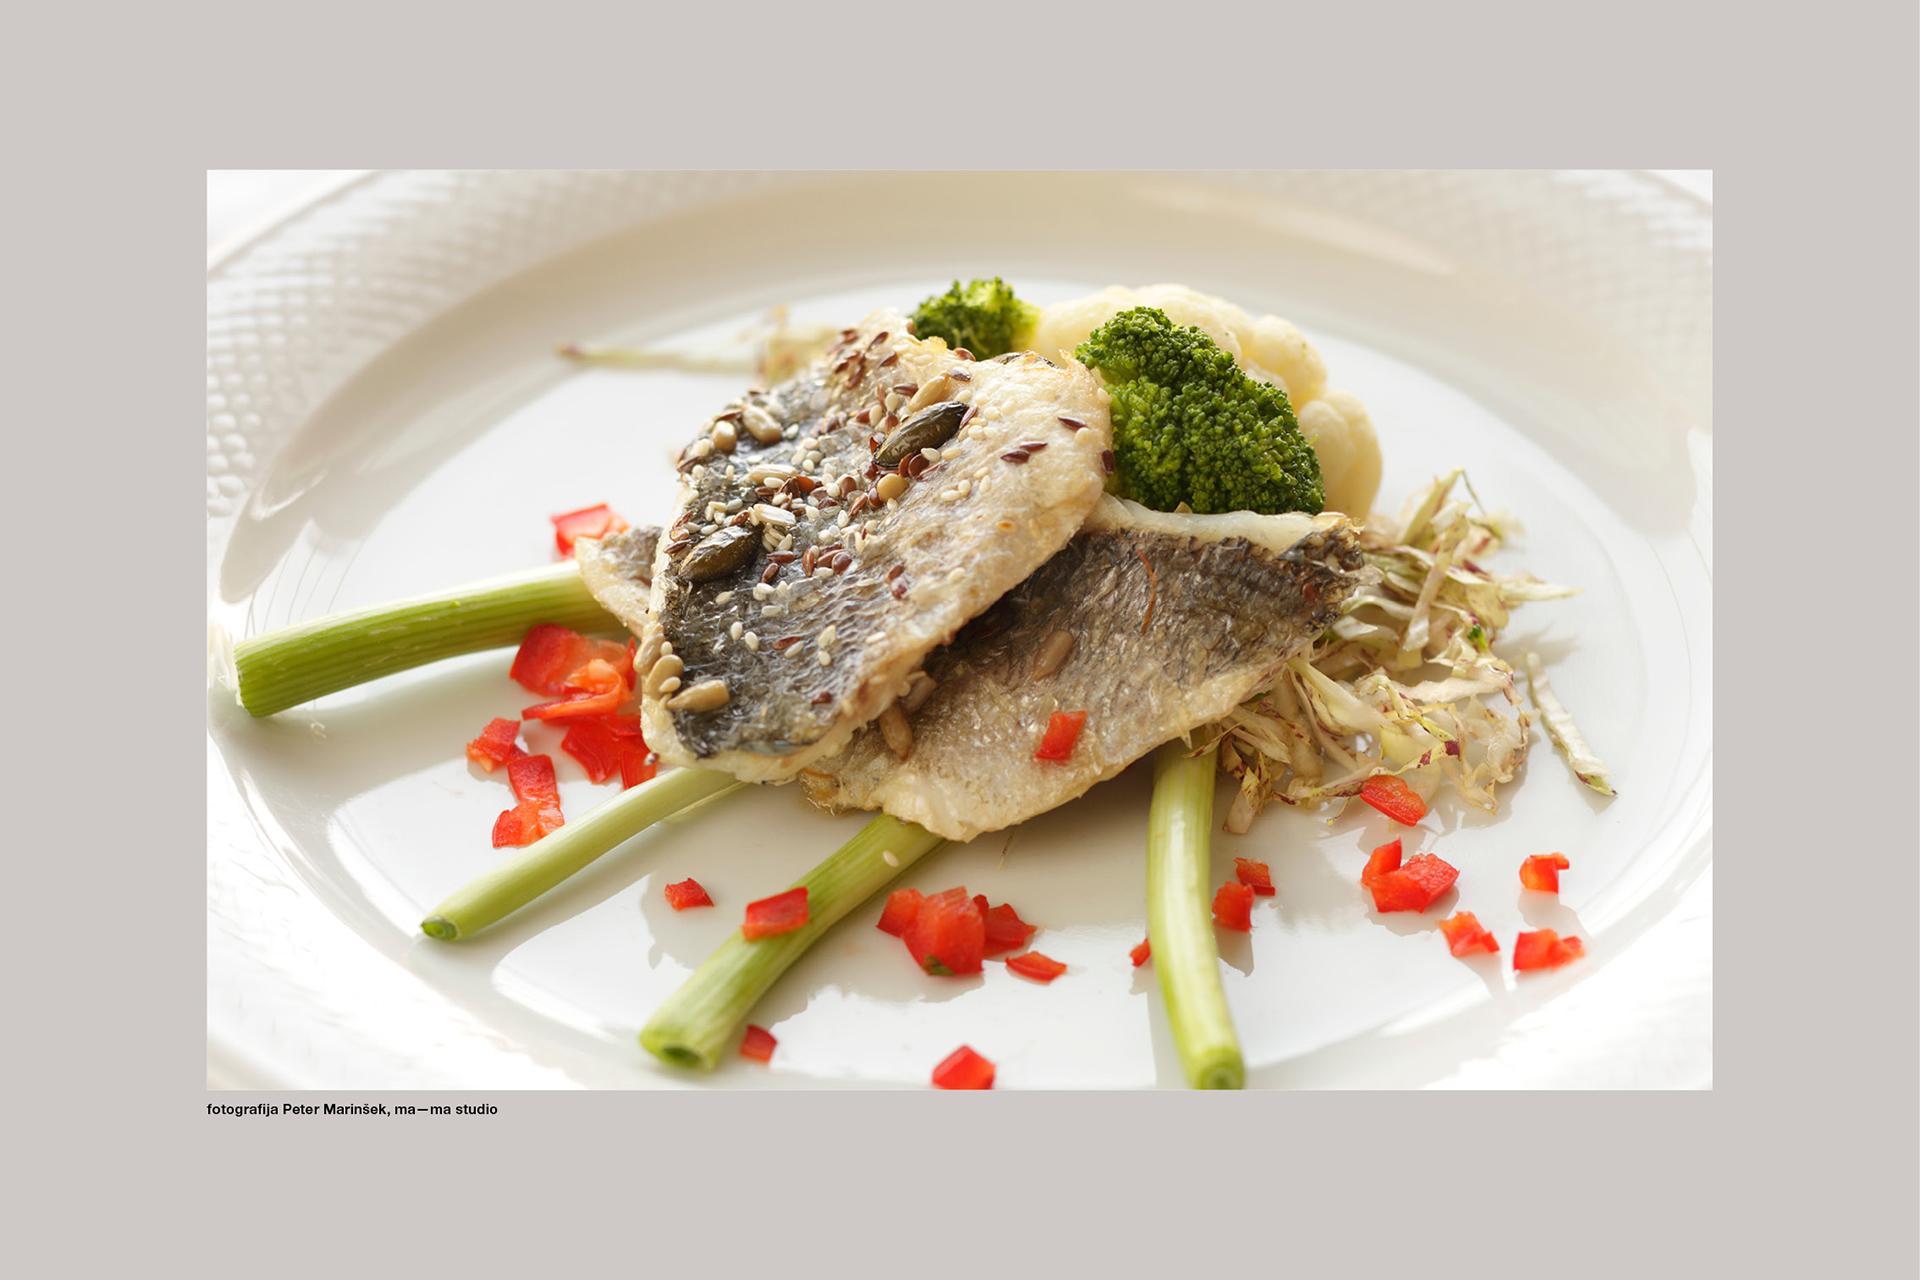 tus_catering_peter_marinsek_ma-ma6